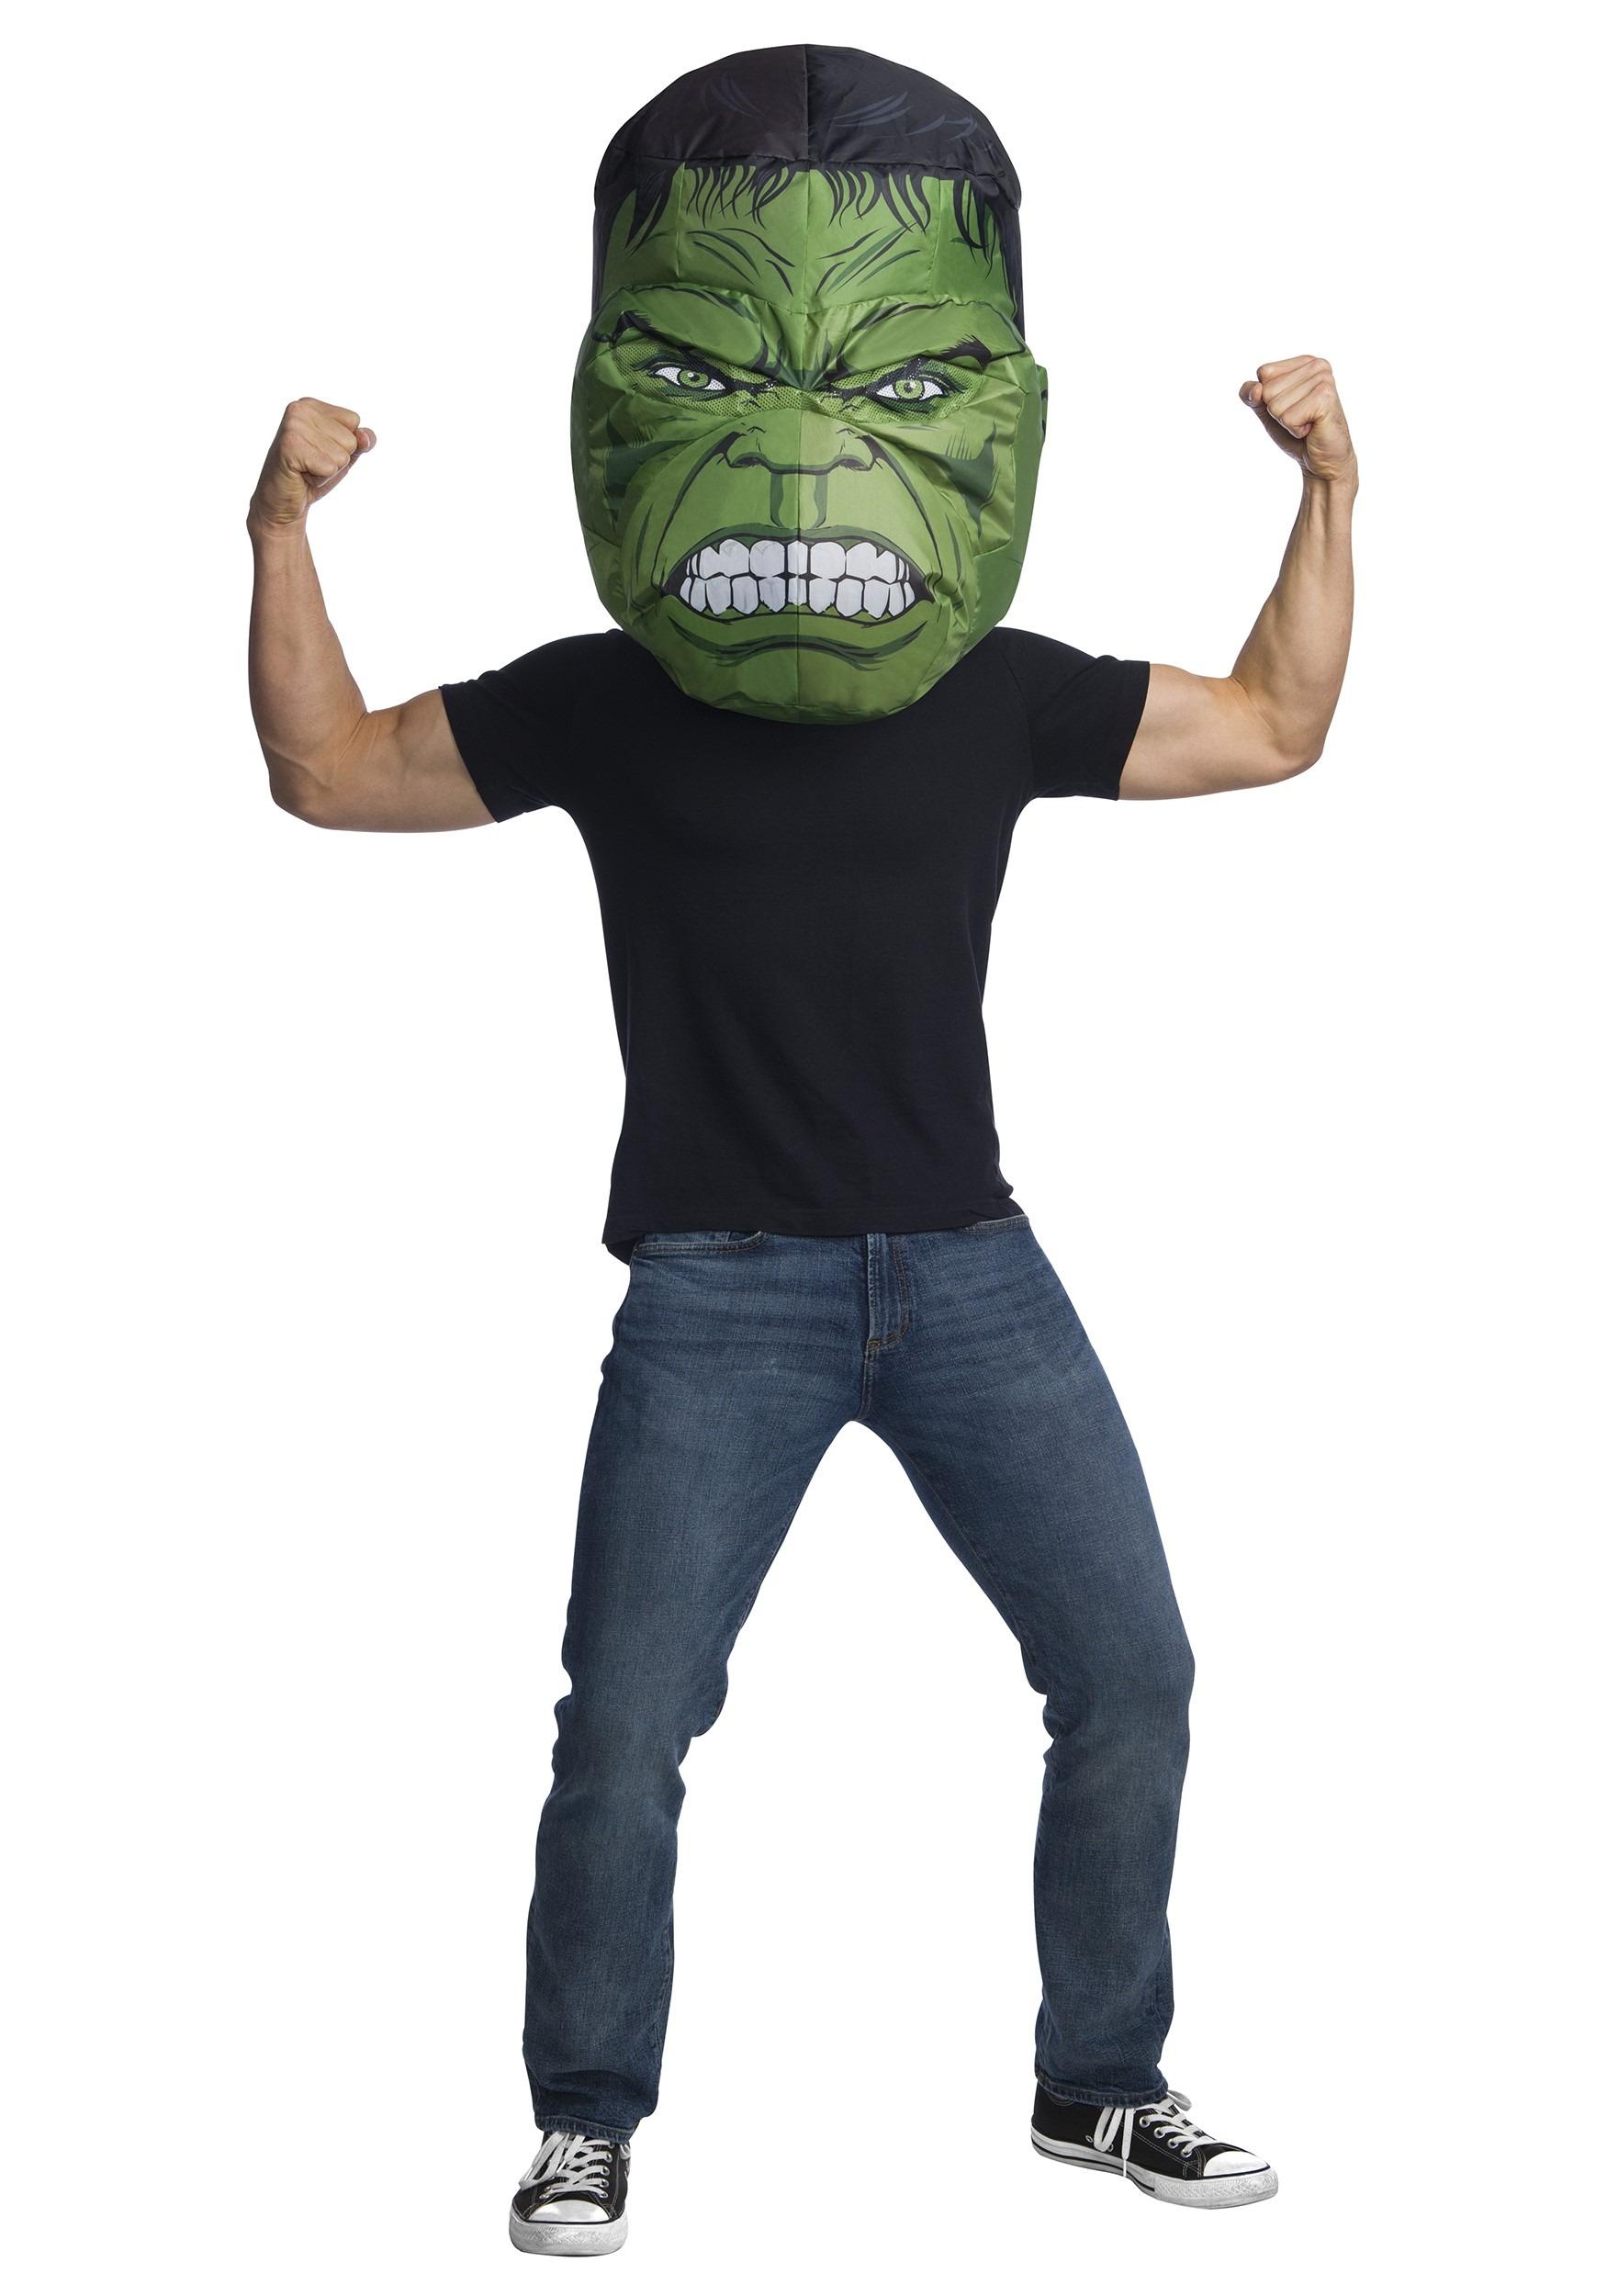 545301bbb2c Avengers Endgame Incredible Hulk Airhead Inflatable Accessory